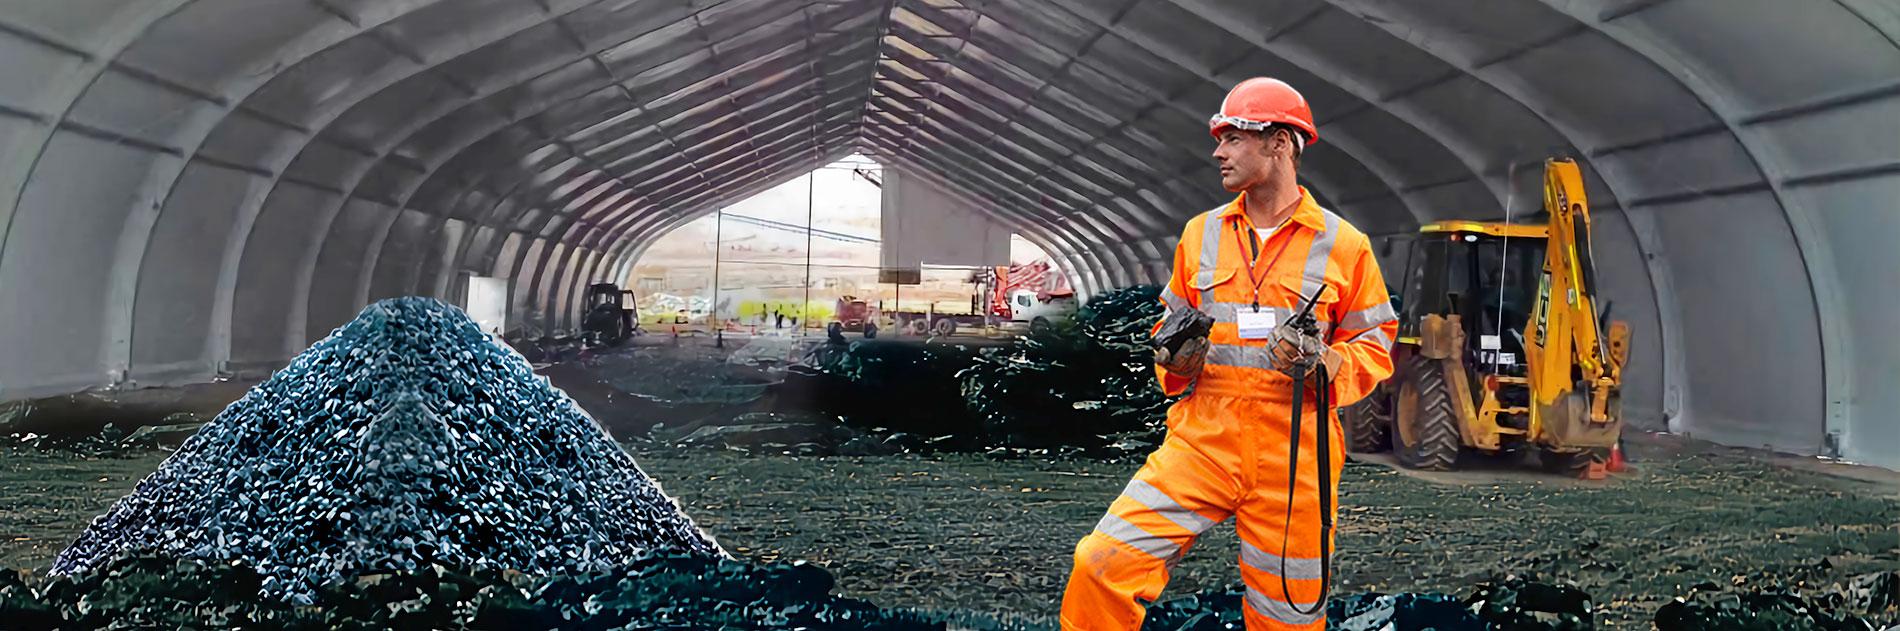 tfs-mining-shelter-temporary-construction-tents